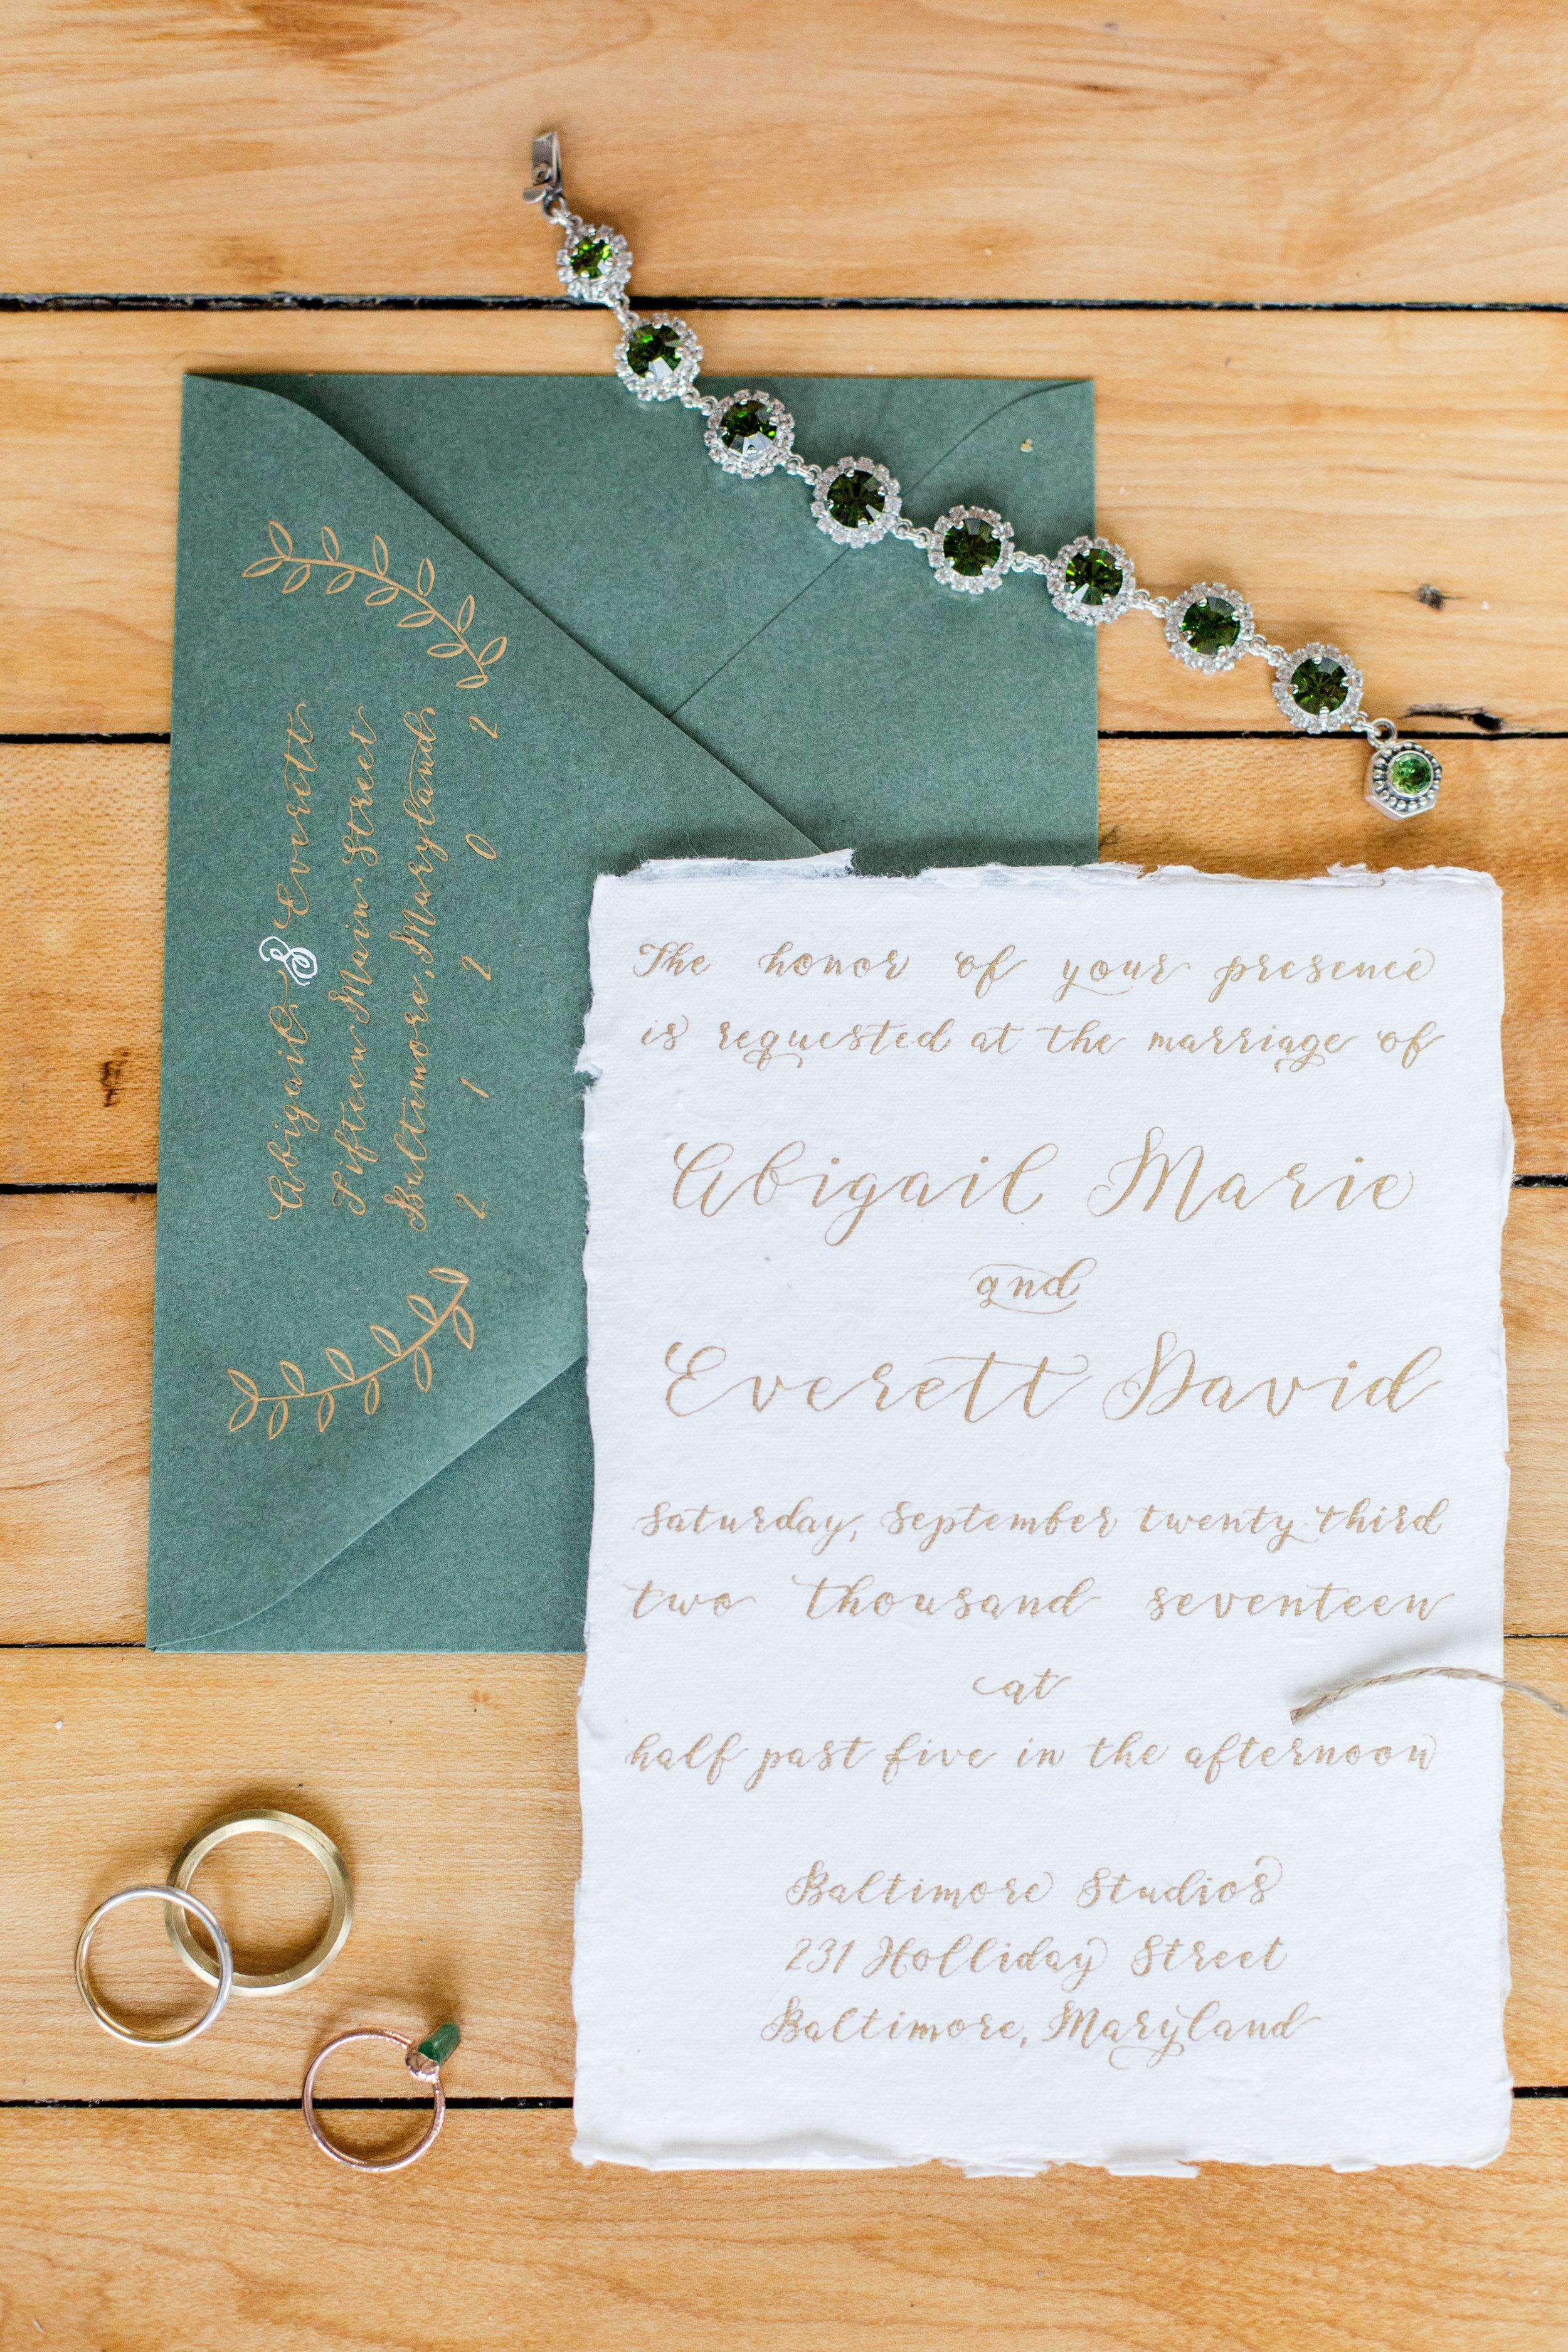 Central PA, York PA, JesSmith Designs, custom, wedding, invitations, bridal, announcements, save the date, birth, baby, motherhood, hanover, calligraphy, handlettering_025.jpg